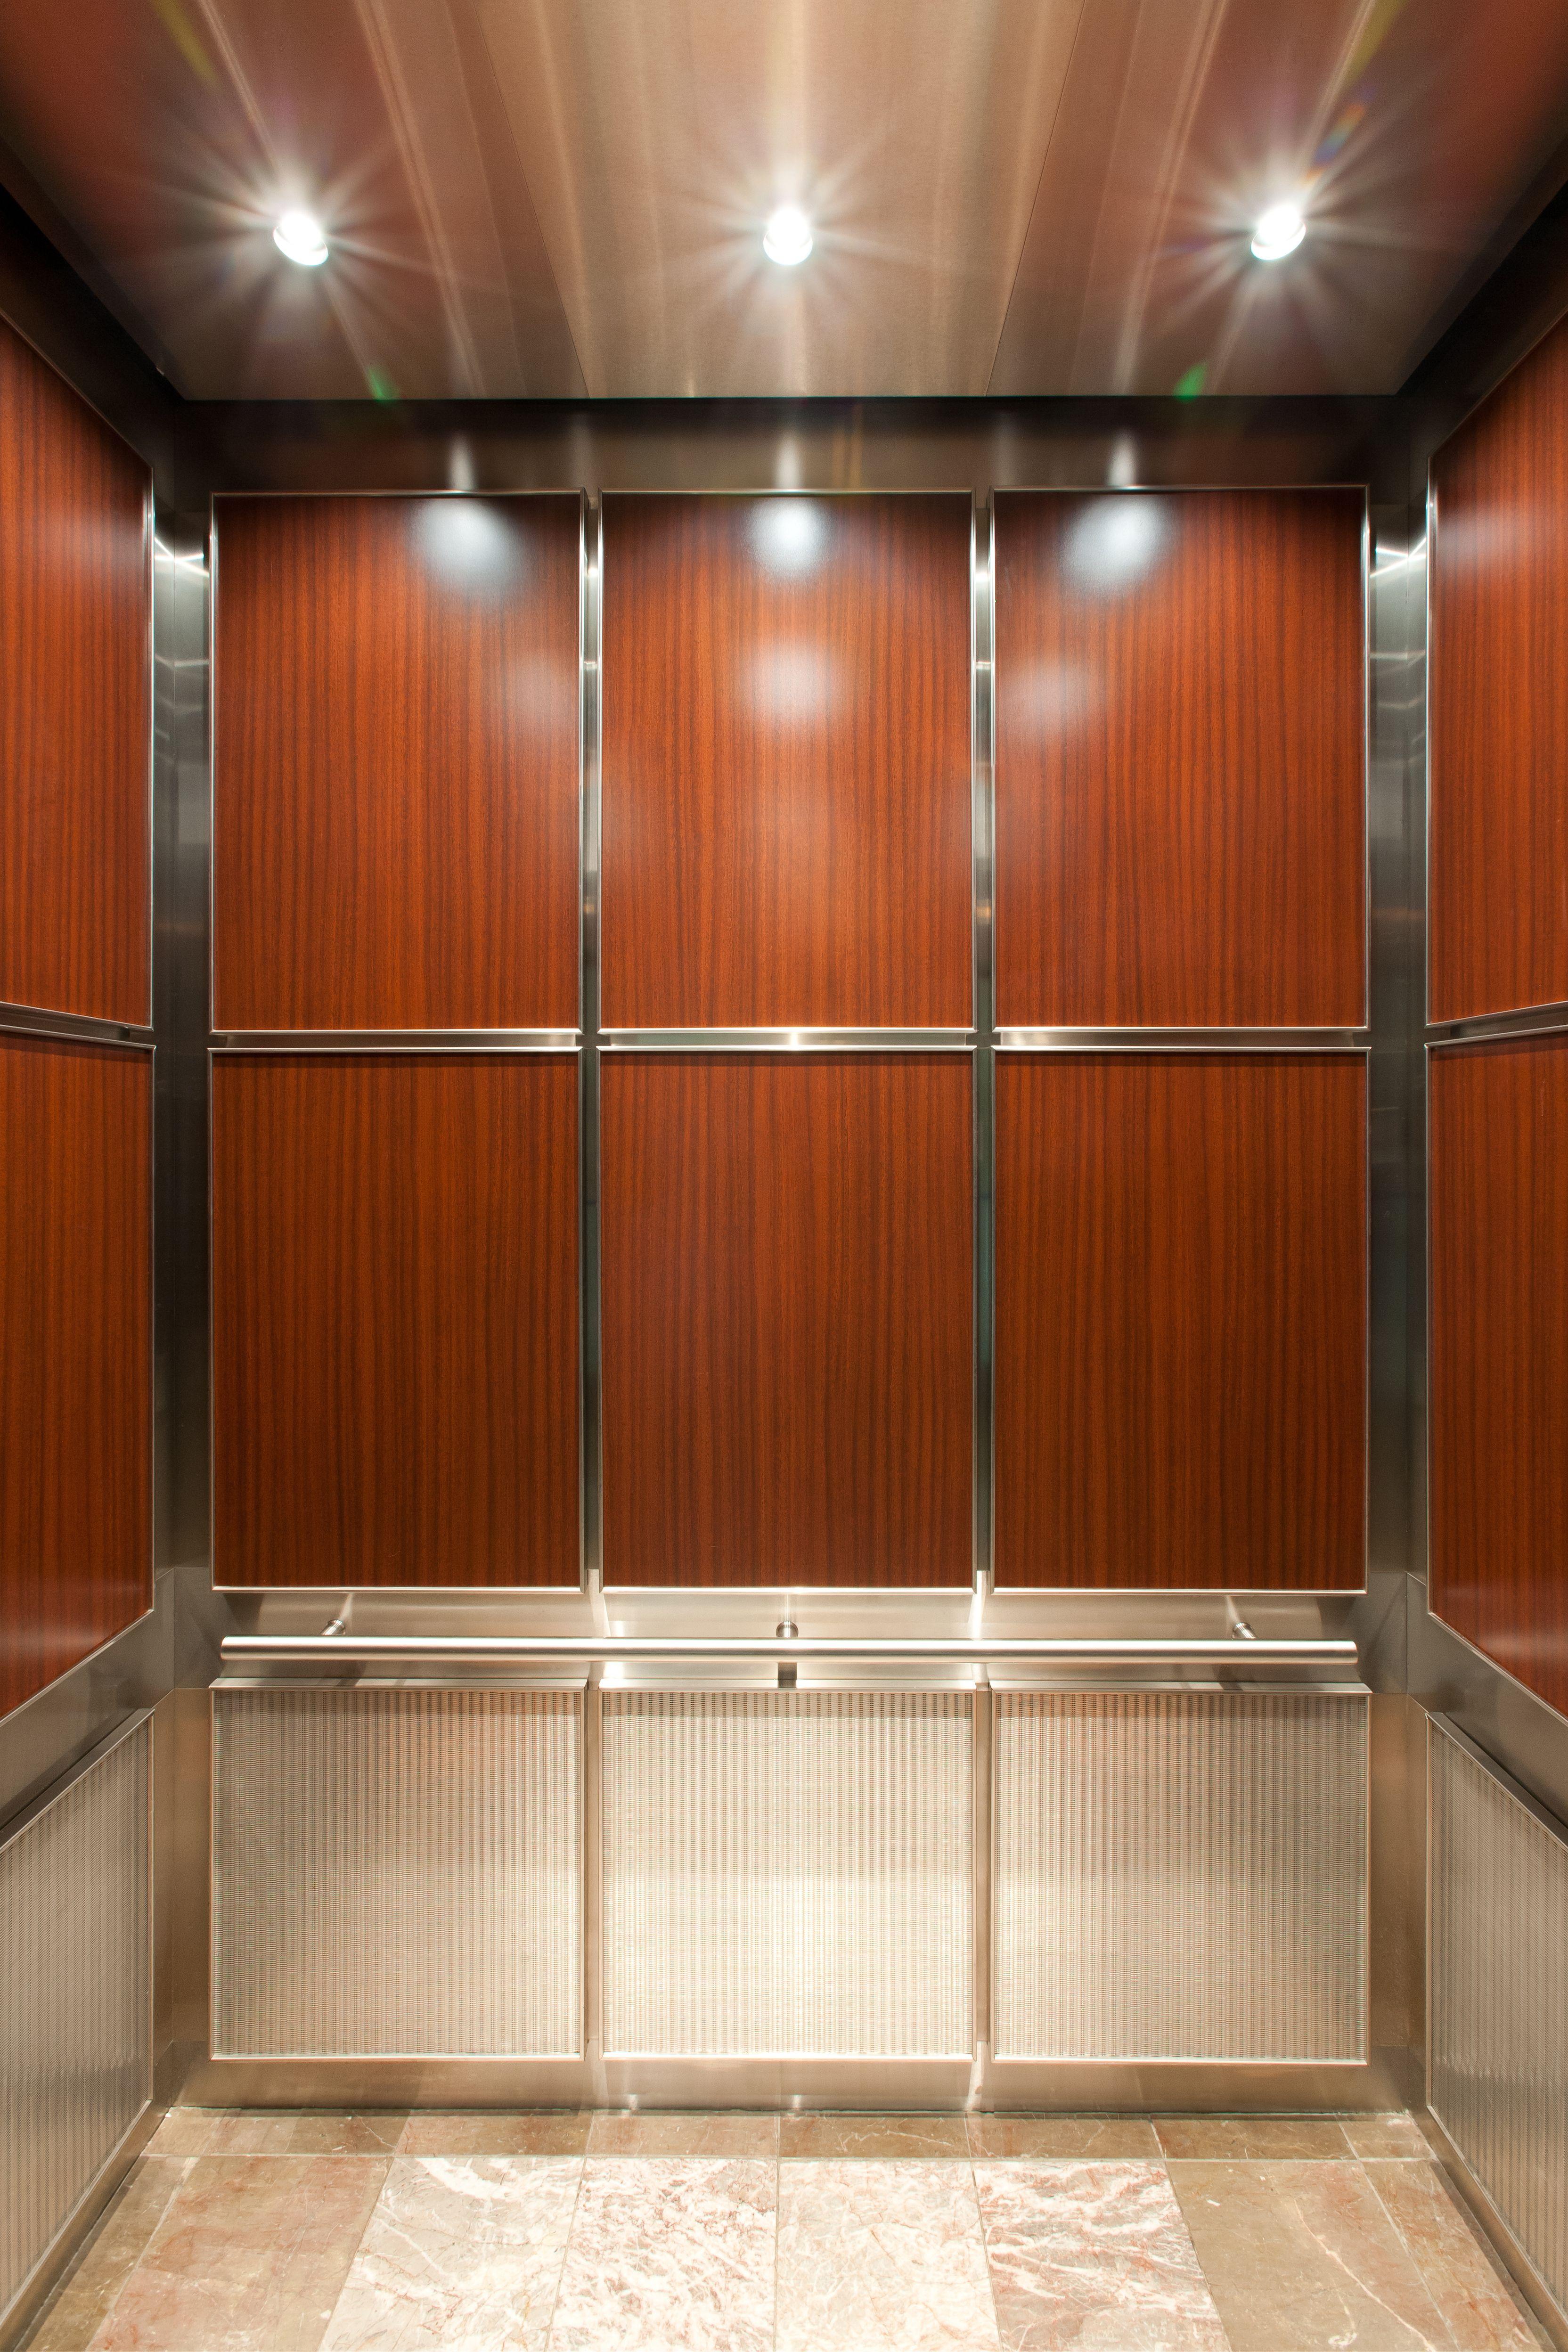 Chesapeake Elevator Interiors Inc